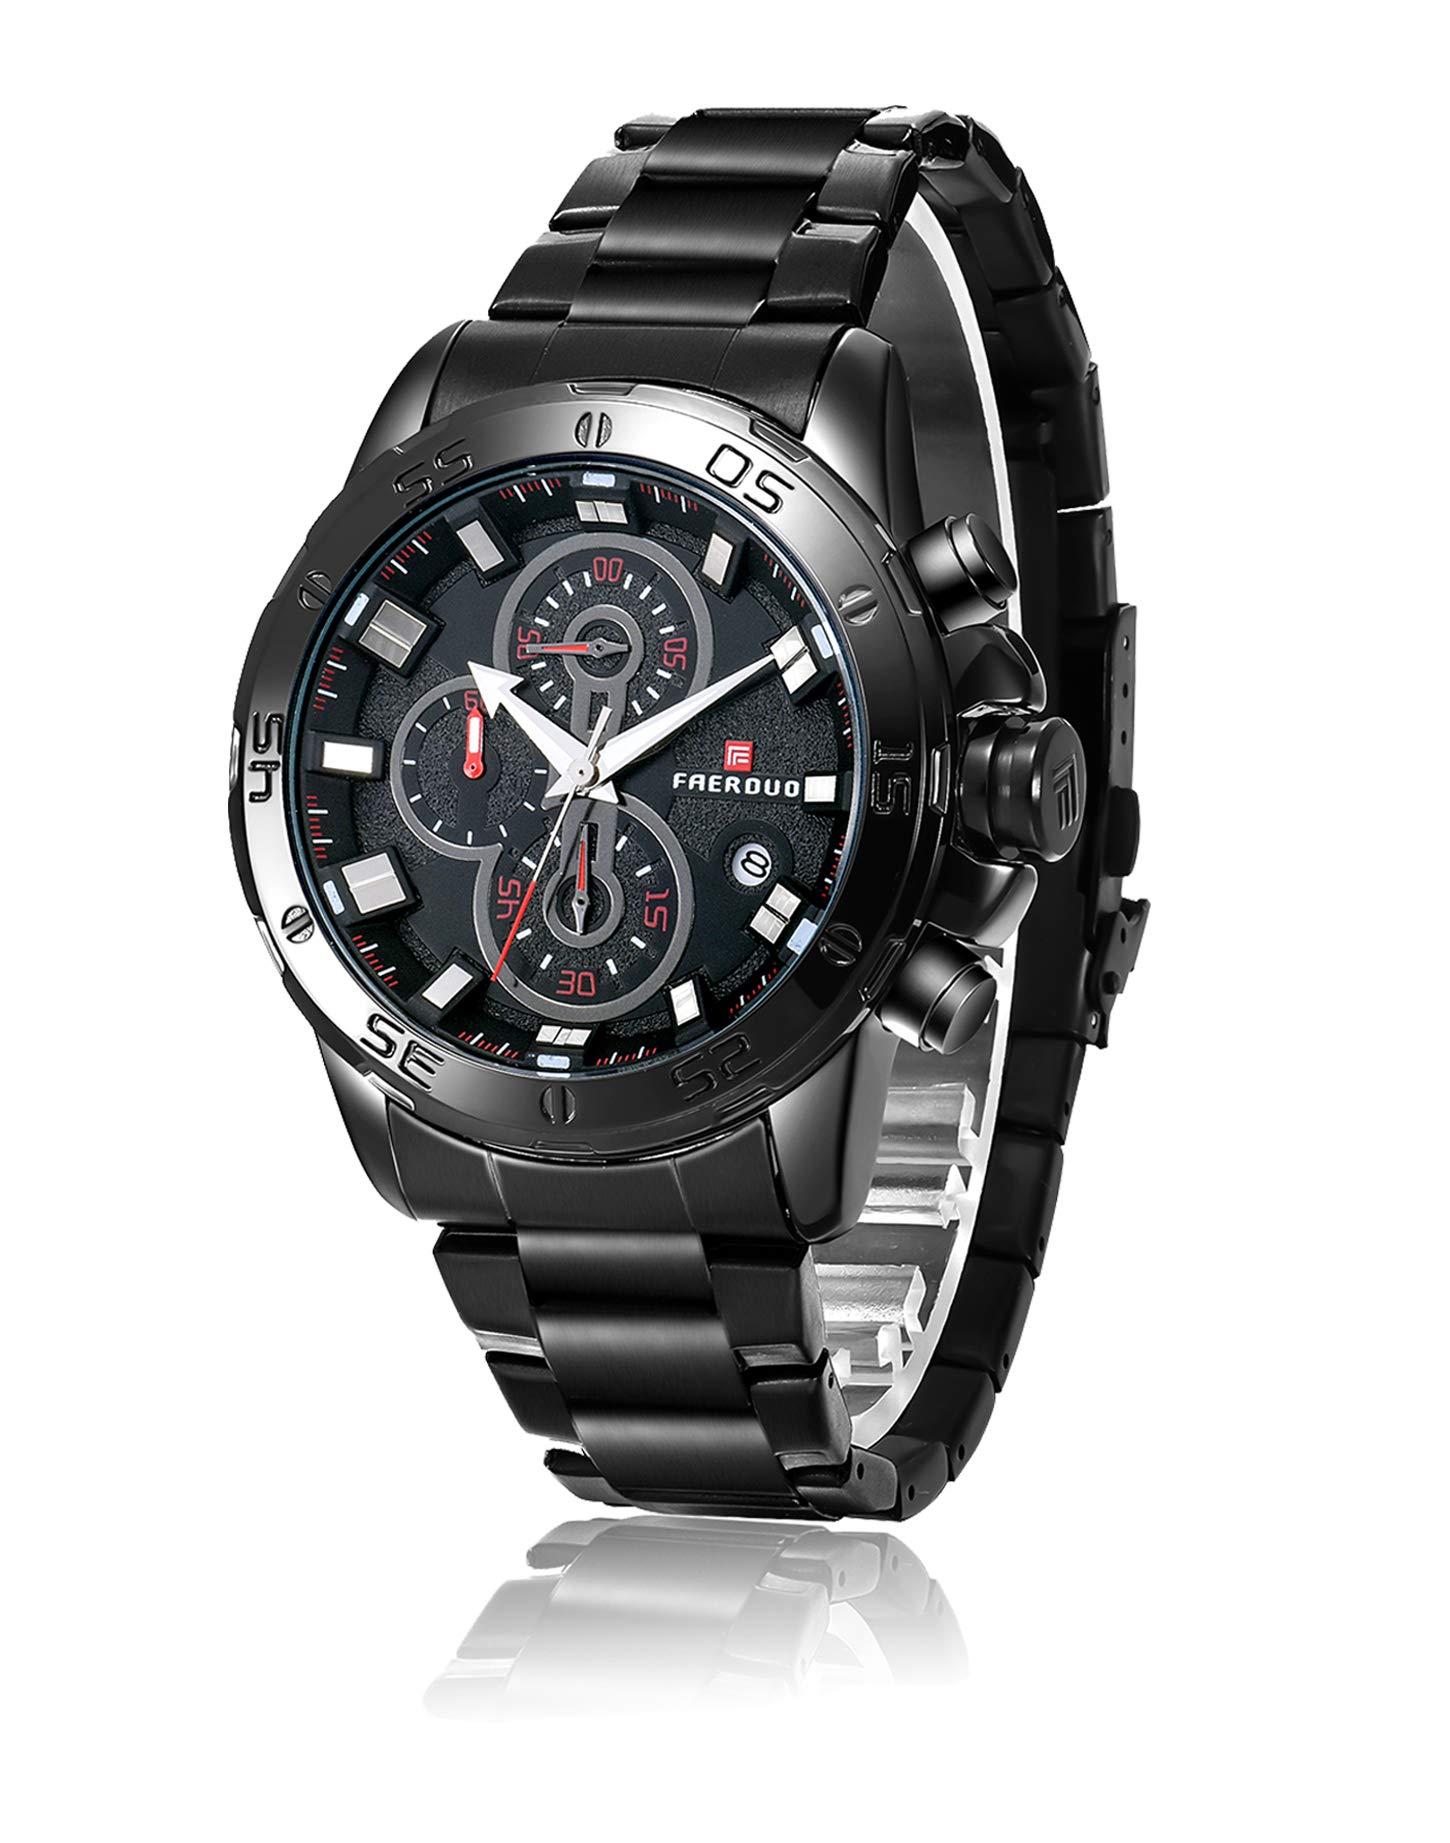 4a925b962c06 Inicio   Baratos   FAERDUO Reloj Hombre Negro Lujo Moda Relojes de Pulsera  para Hombres Vestir Casual Impermeable Reloj de Cuarzo para Hombre con Banda  ...